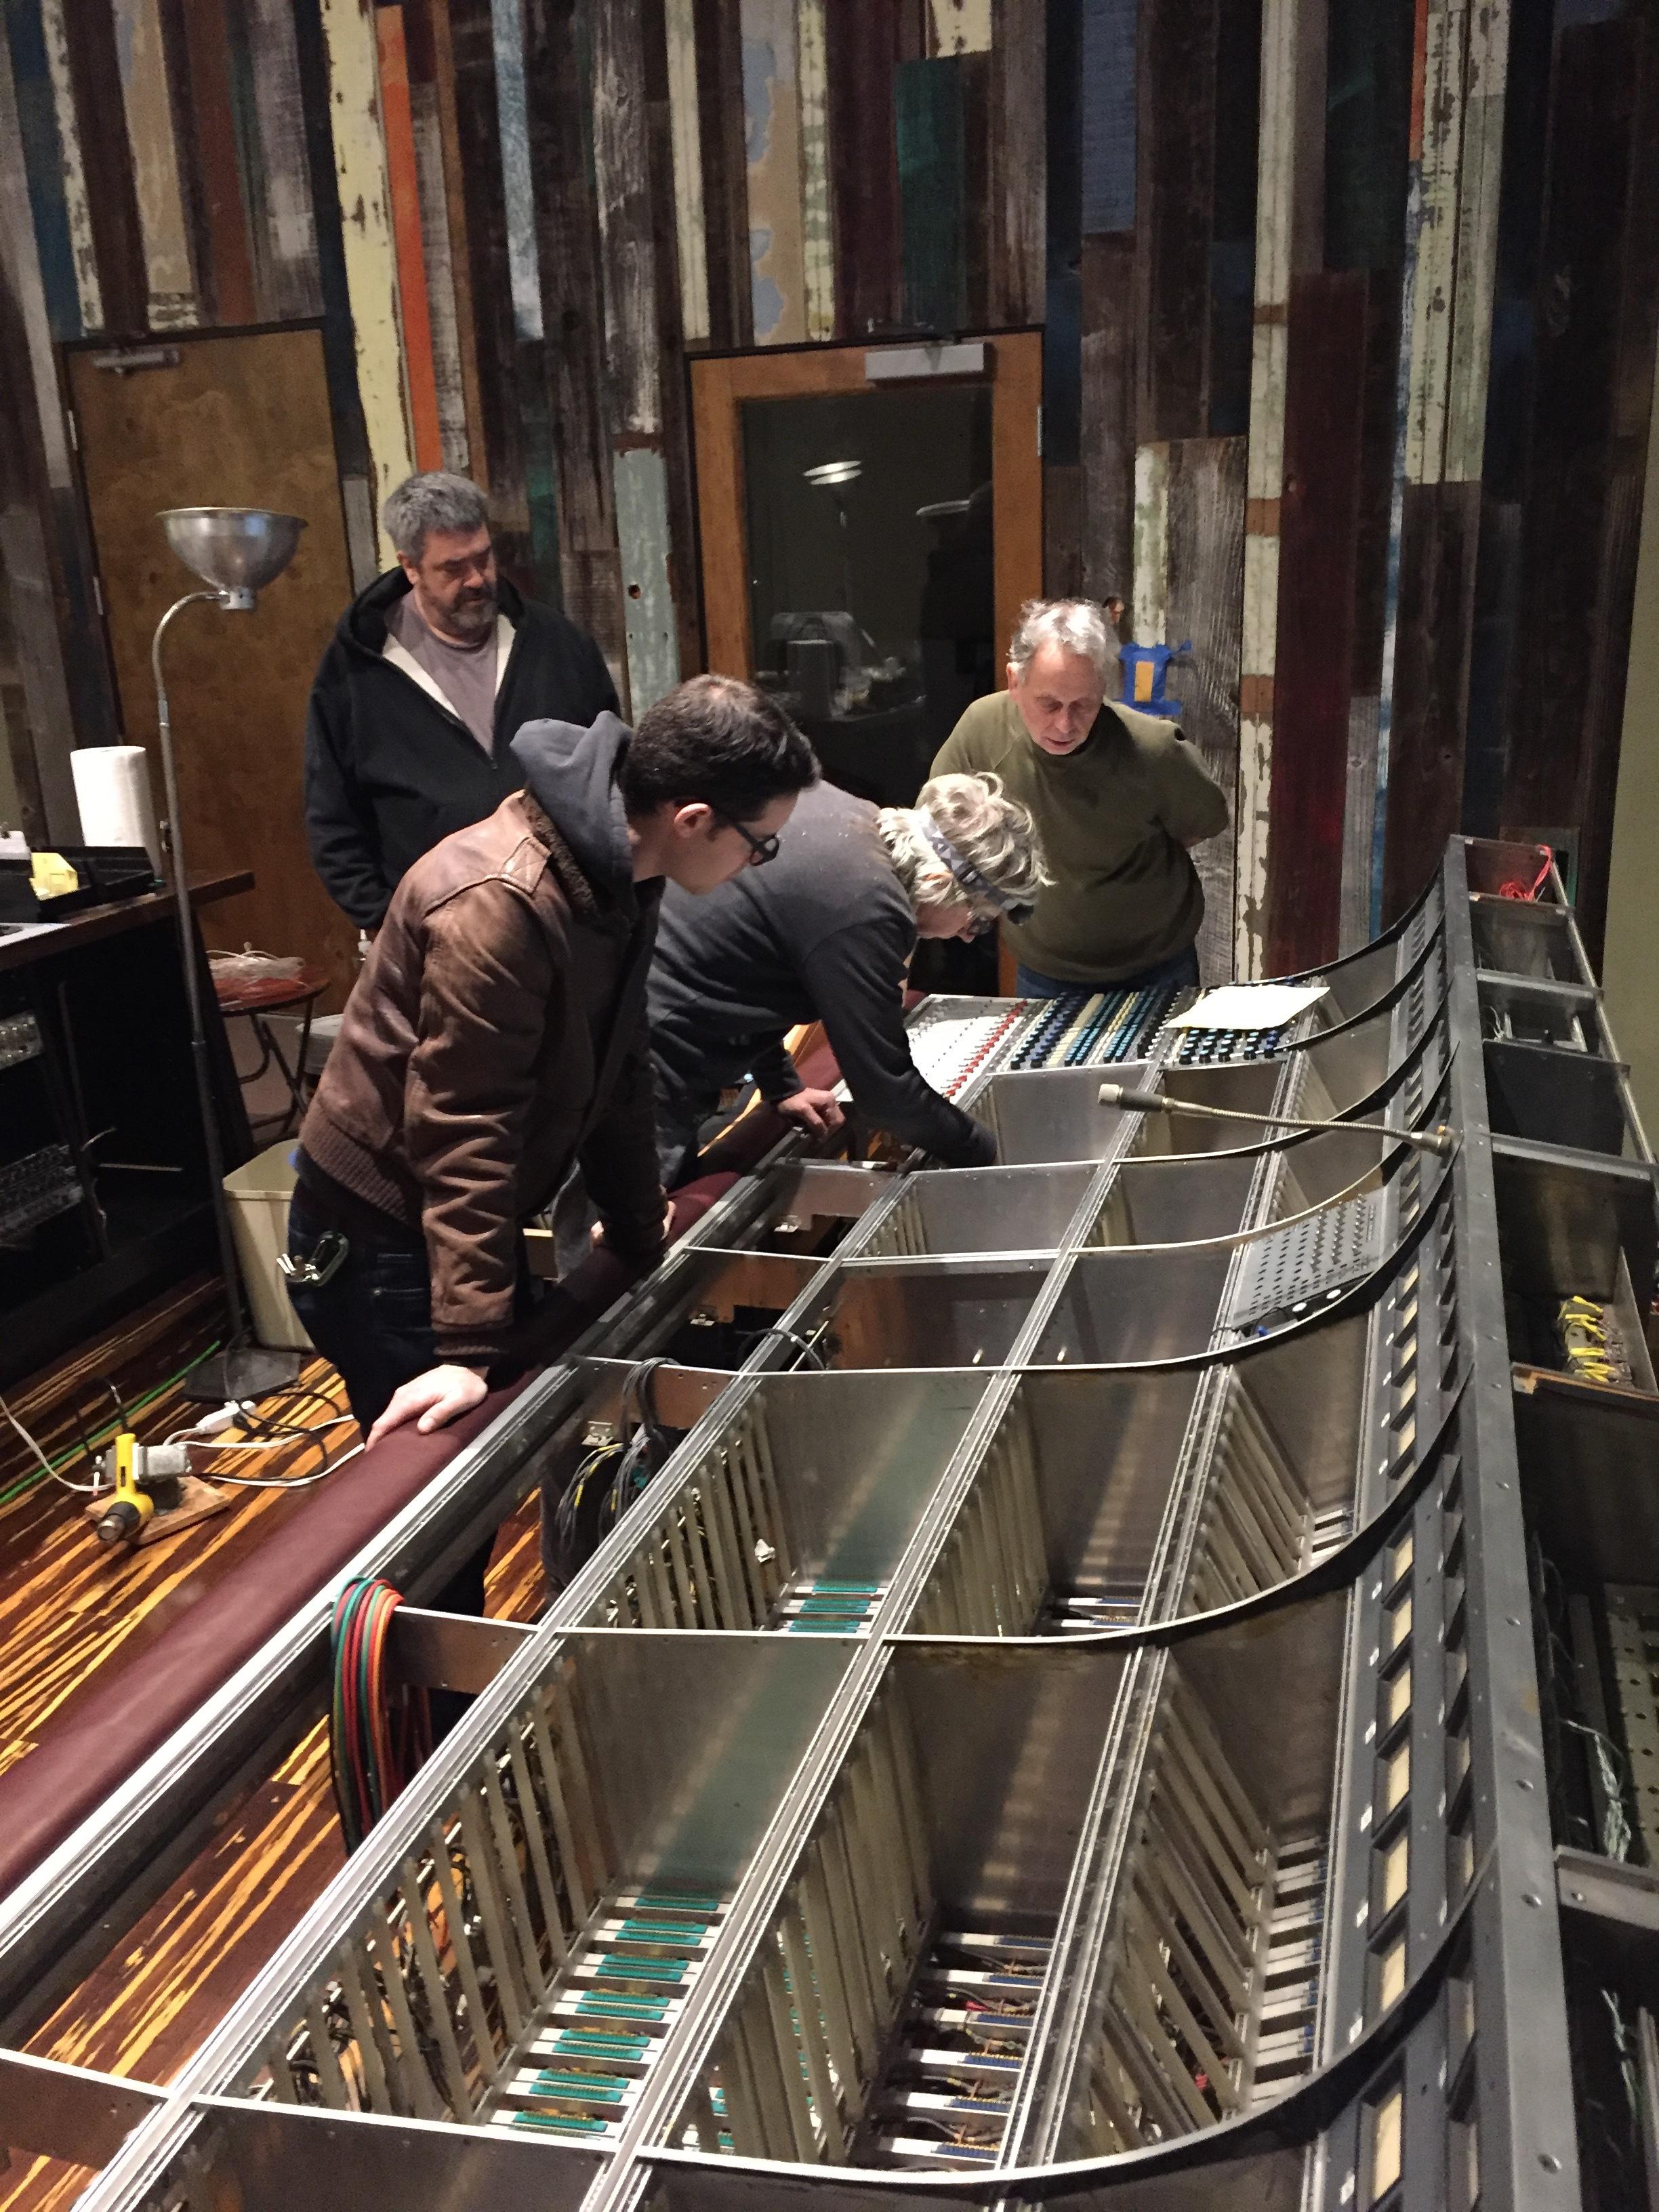 Dave, Jacob Winik, John Vanderslice, Garry Creiman at Tiny Telephone